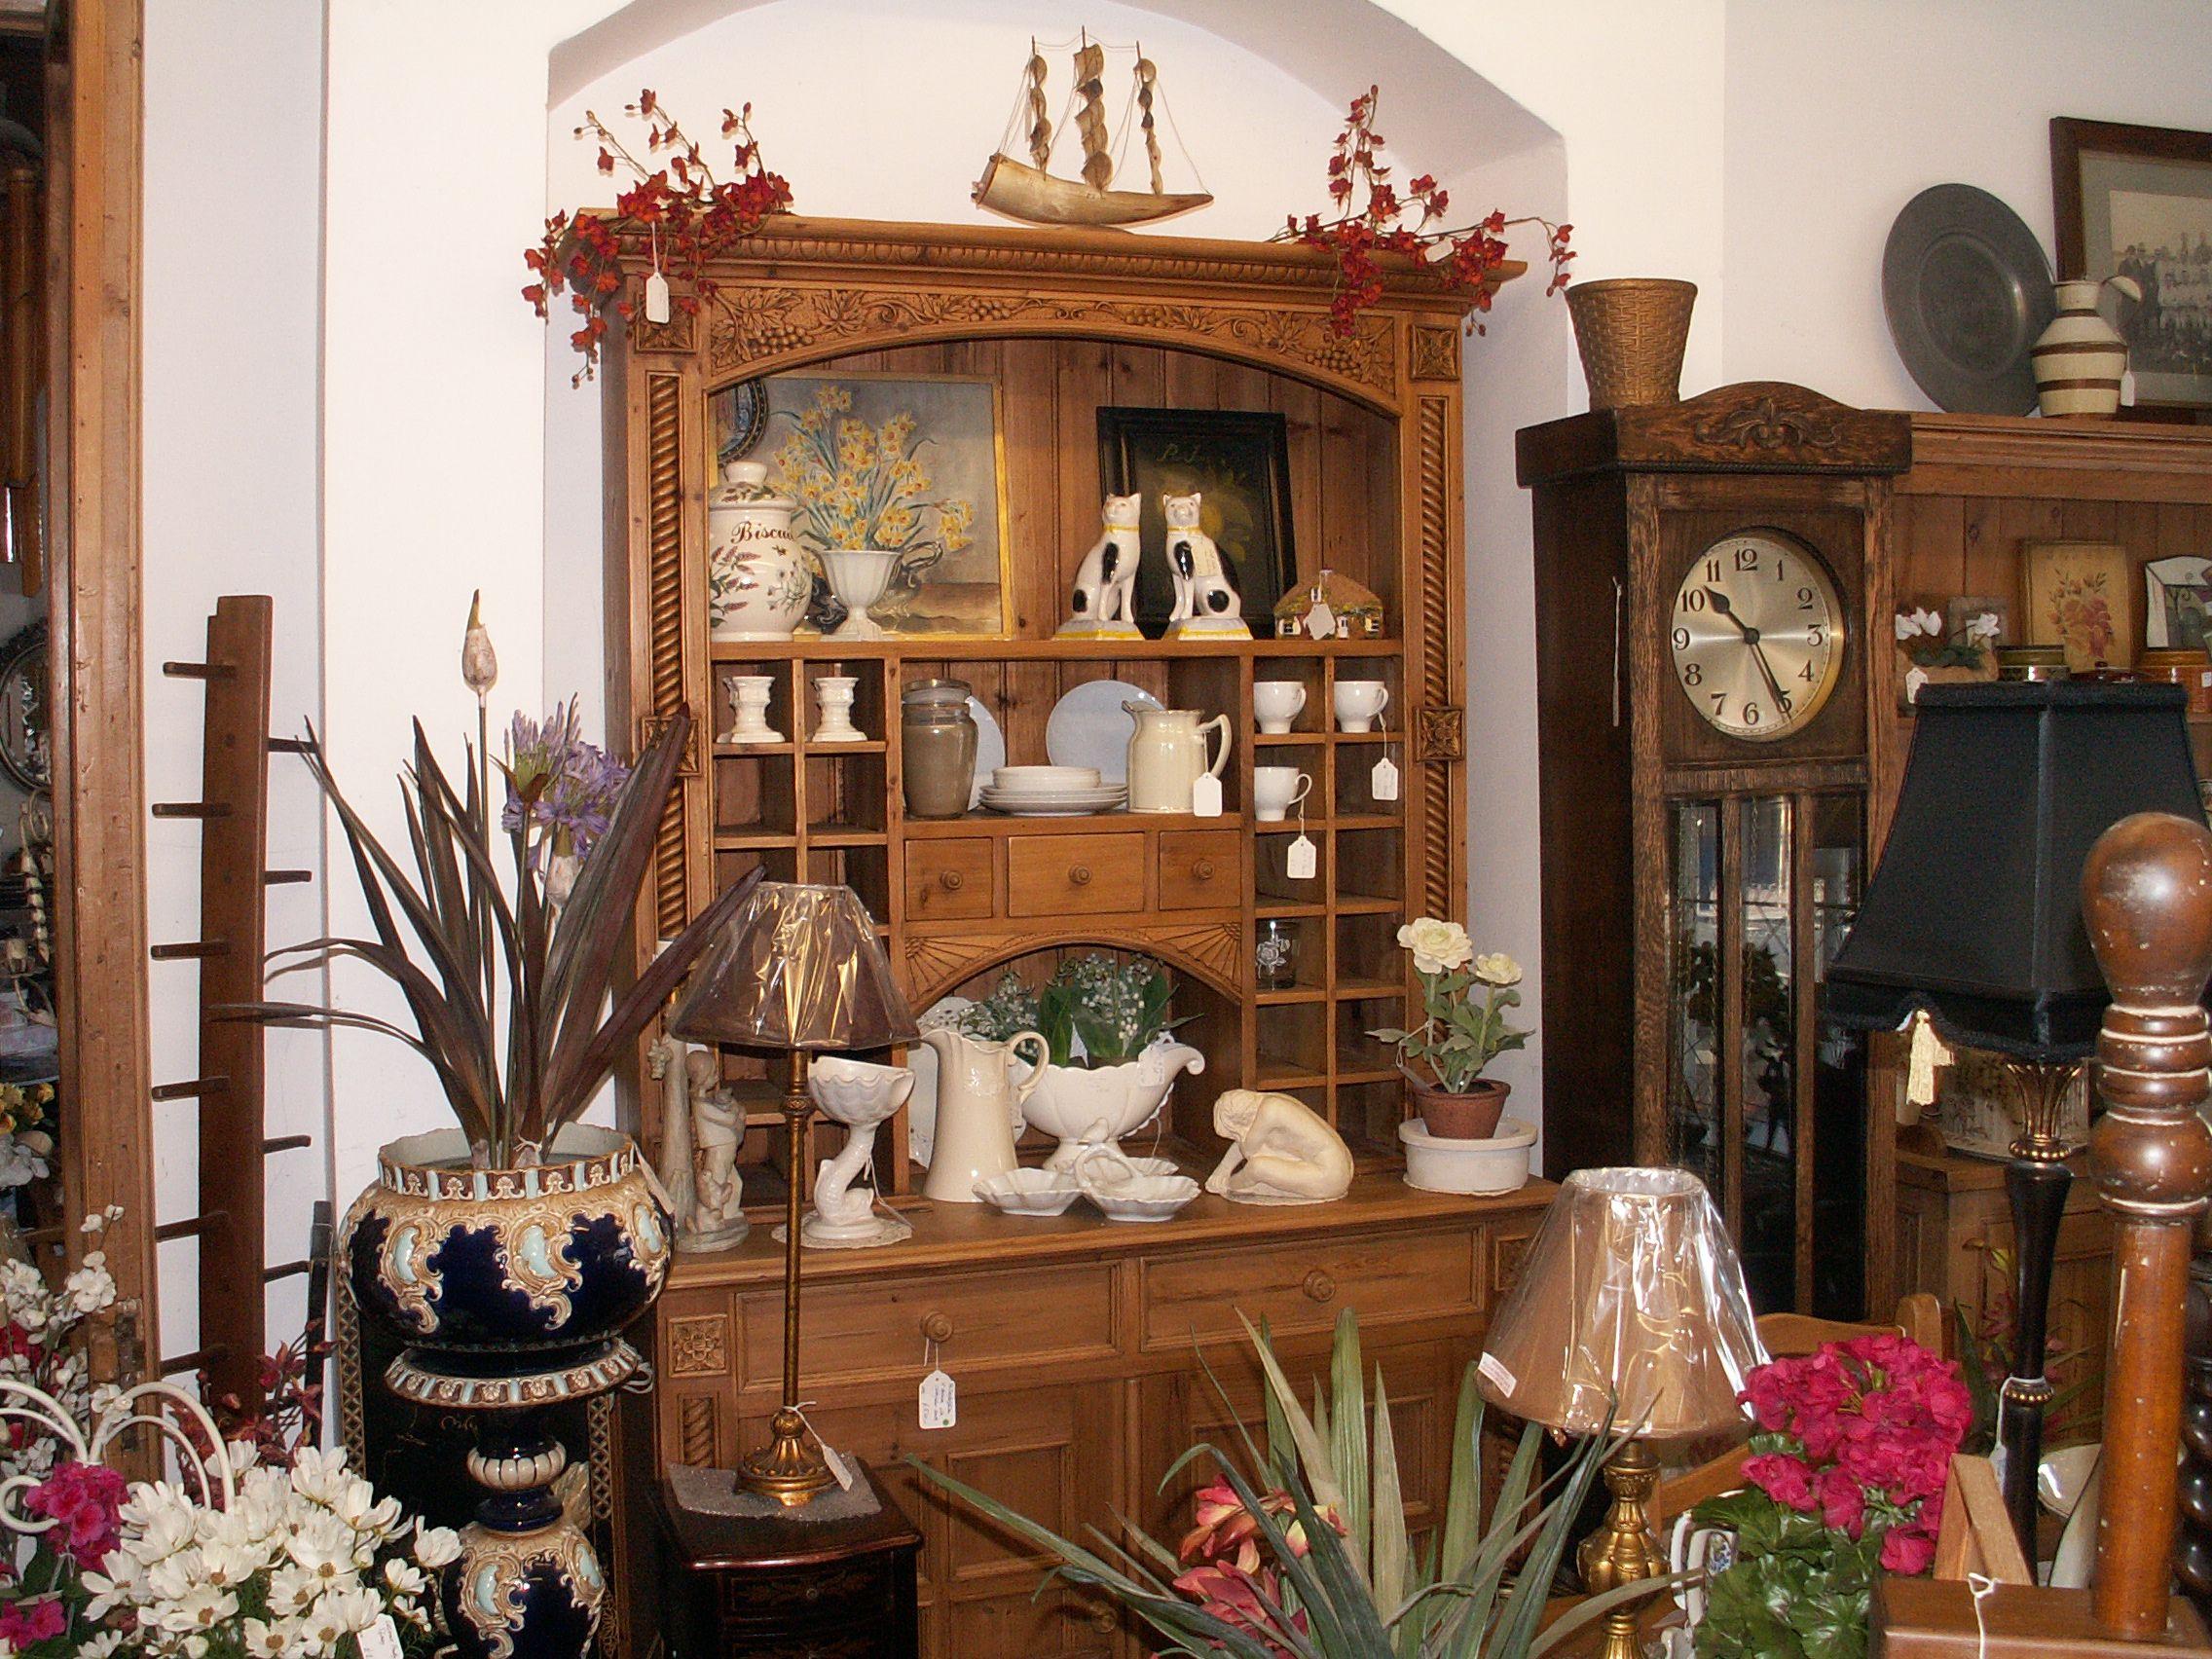 Marvelous Antiques Furniture | Antique Oak Furniture In Kent : Old English Pine  01303248560